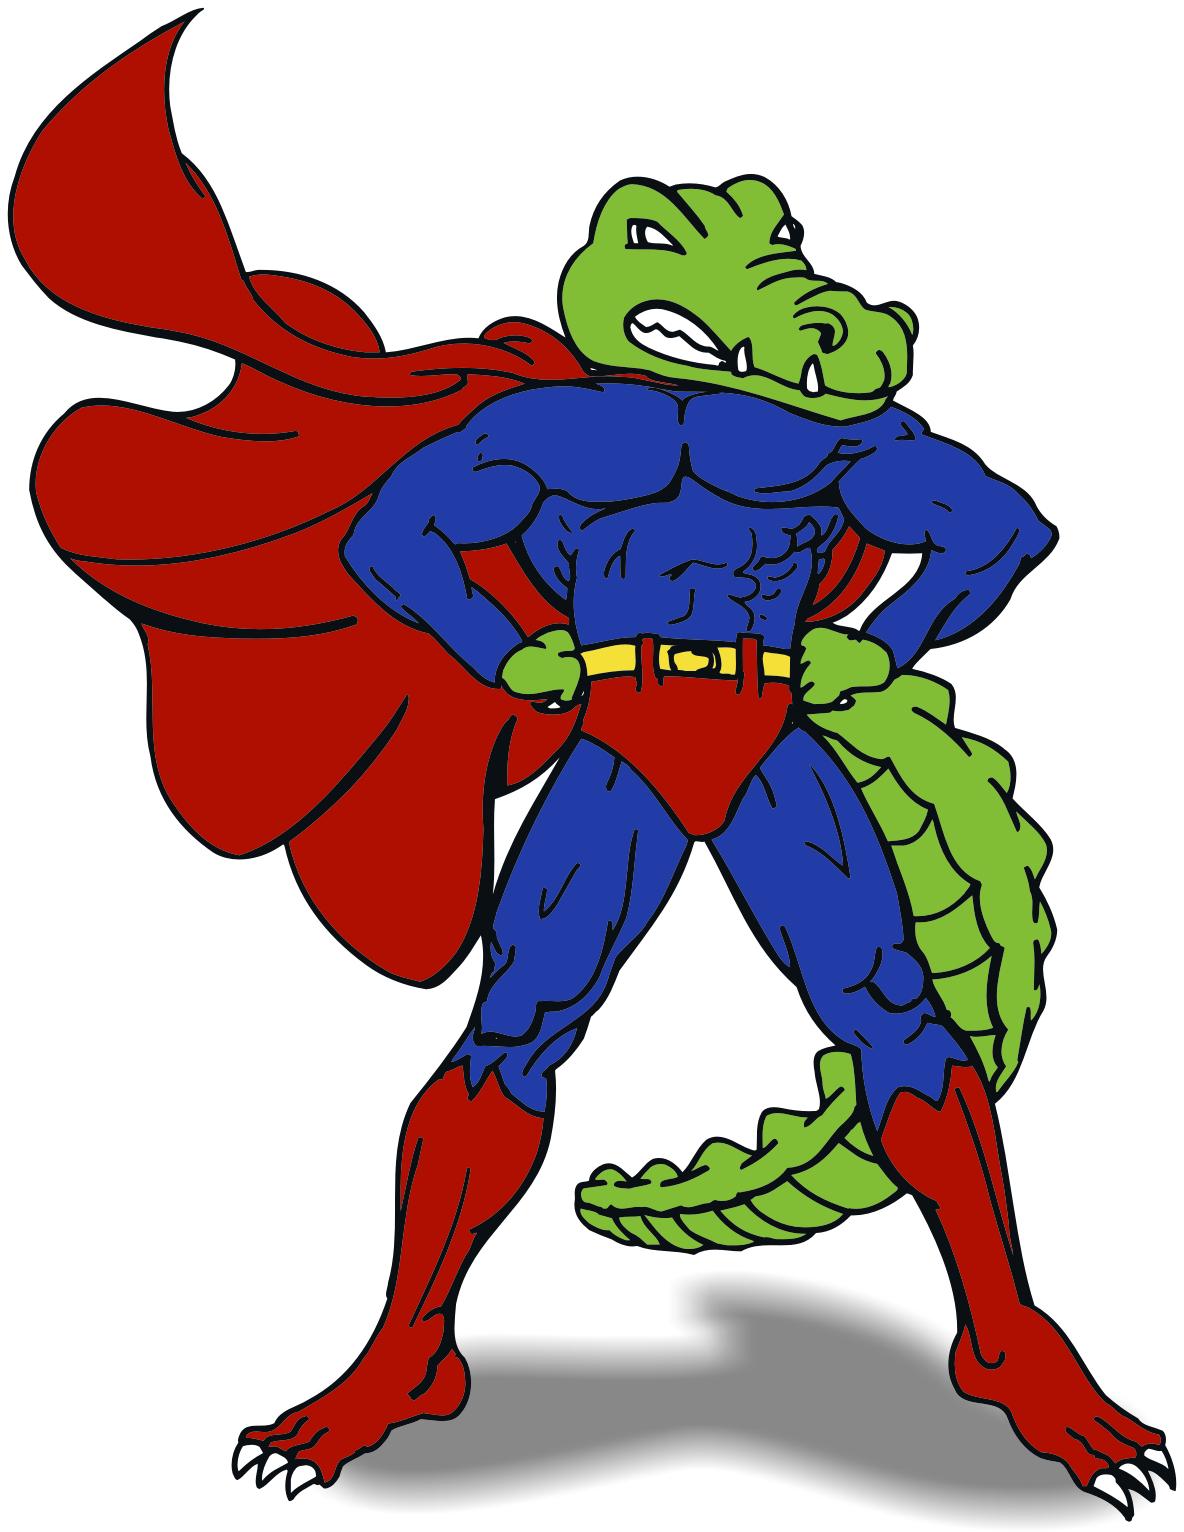 1184x1532 Alligator Clipart Superhero